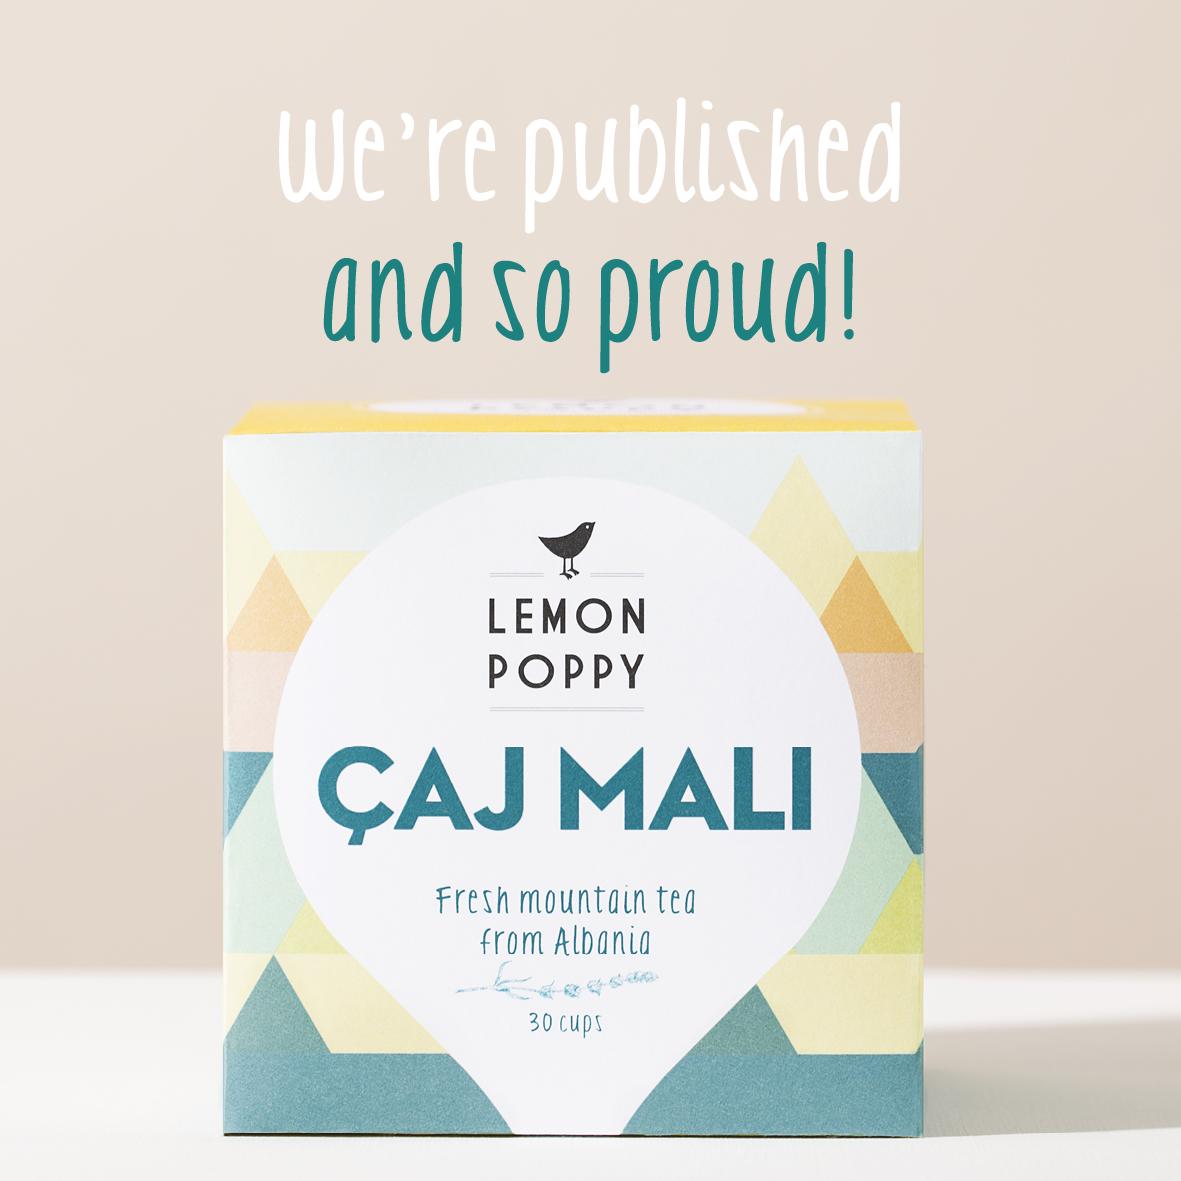 Lemon Poppy thee tea amsterdam Holland Caj Mali albanie thee webshop shop online